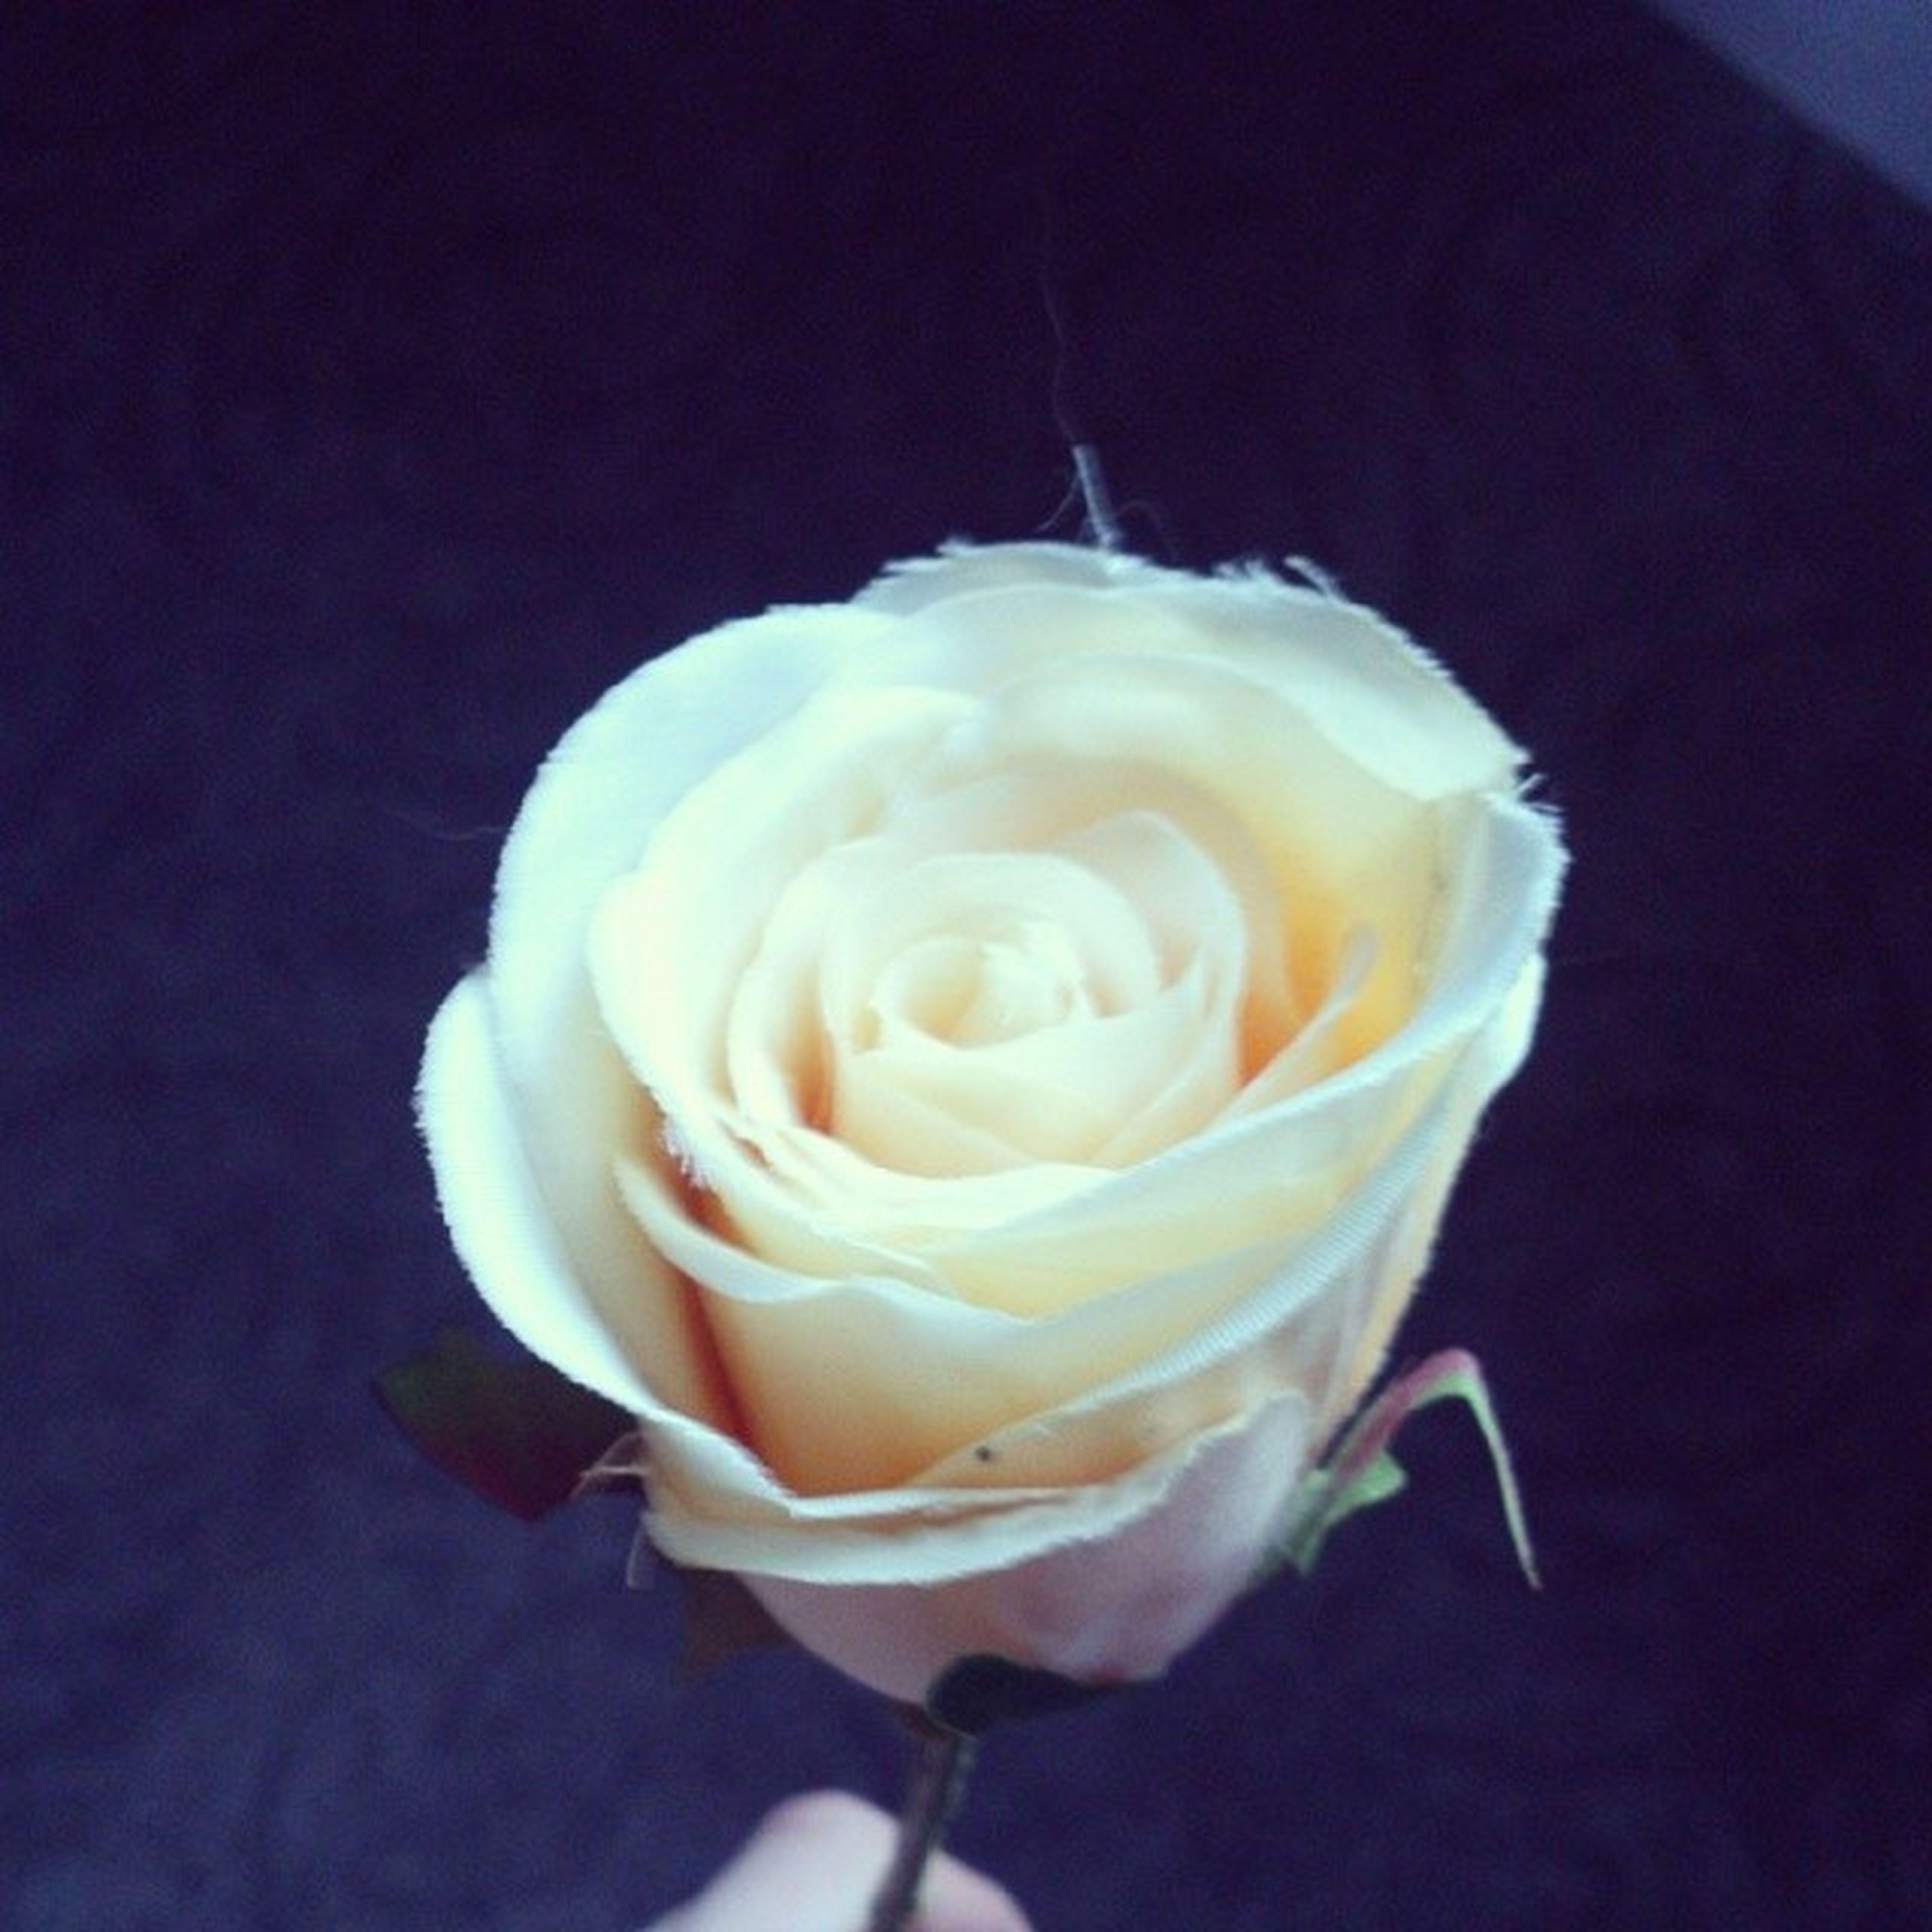 flower, rose - flower, petal, flower head, freshness, fragility, studio shot, rose, single flower, beauty in nature, close-up, white color, black background, nature, single rose, high angle view, indoors, white, no people, softness